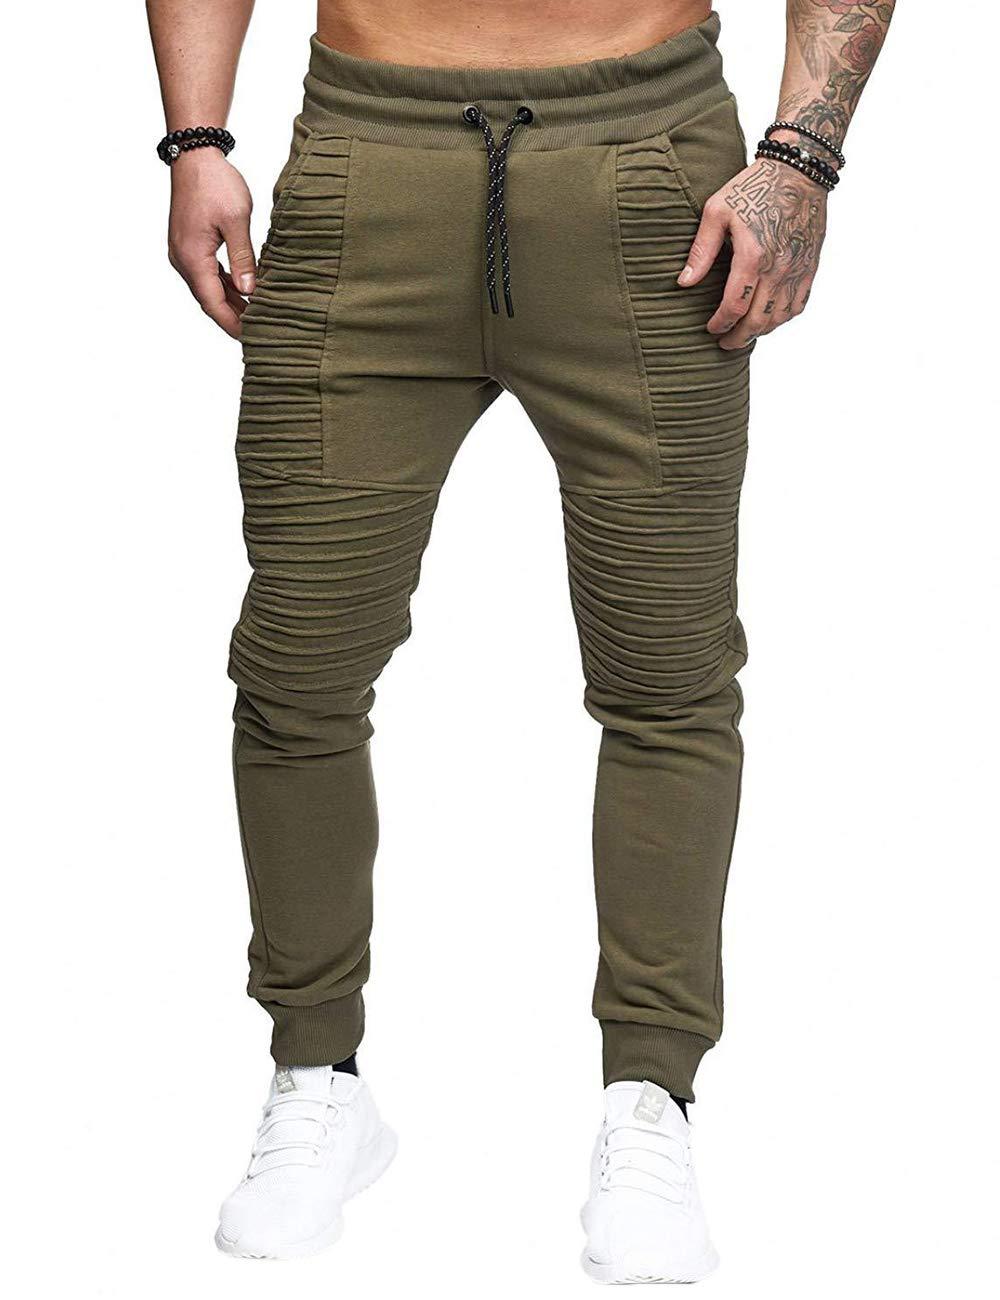 Quando Cintura Quando Pantaloni Cintura Quando Uomo Uomo Cintura Cintura Uomo Pantaloni Pantaloni Uomo Pantaloni OZTXkiPu